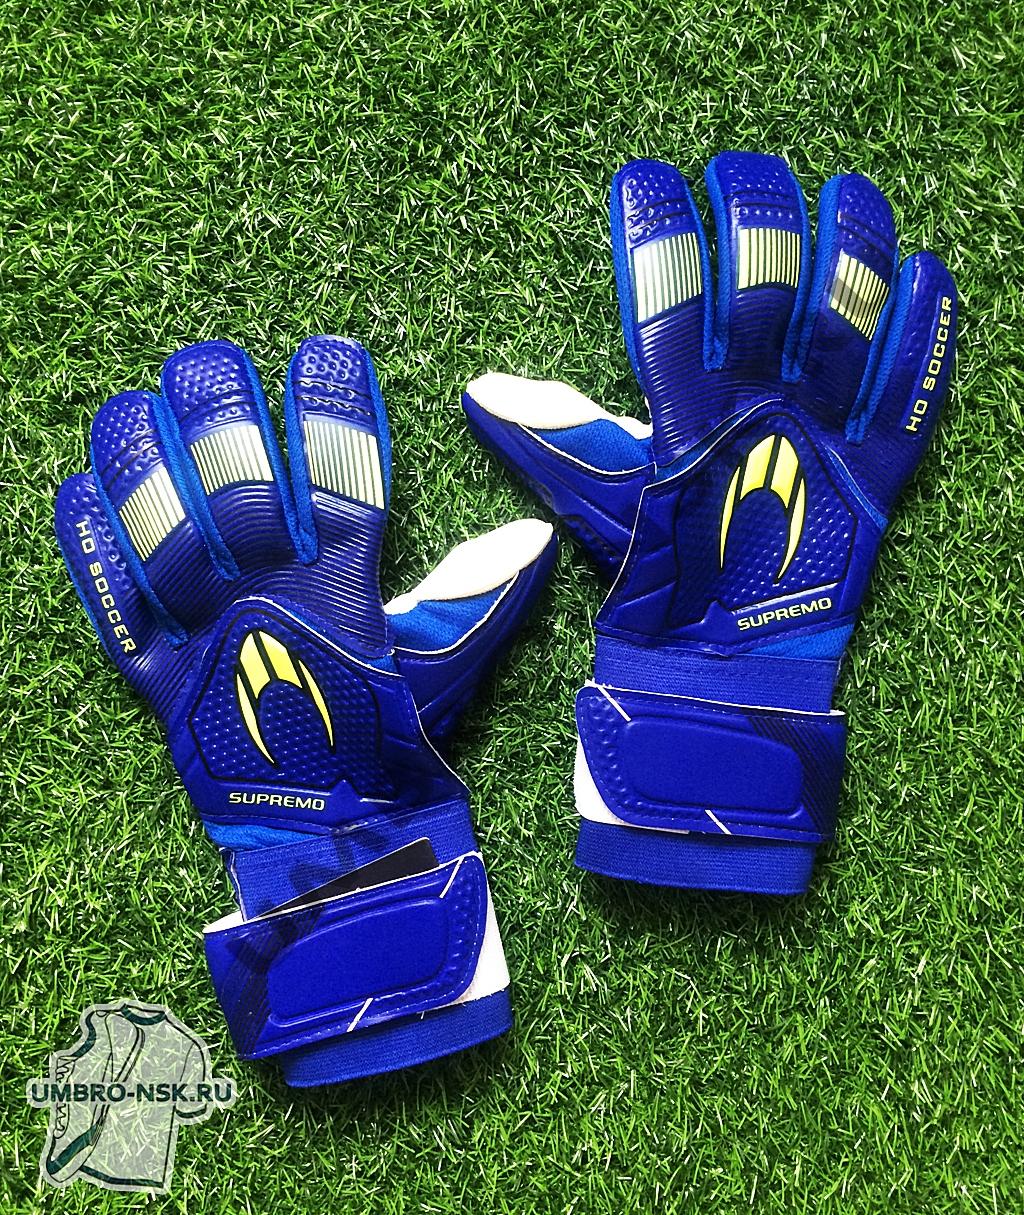 Вратарские перчатки Вратарские перчатки HO Soccer Clone Supremo II Negativу Storm